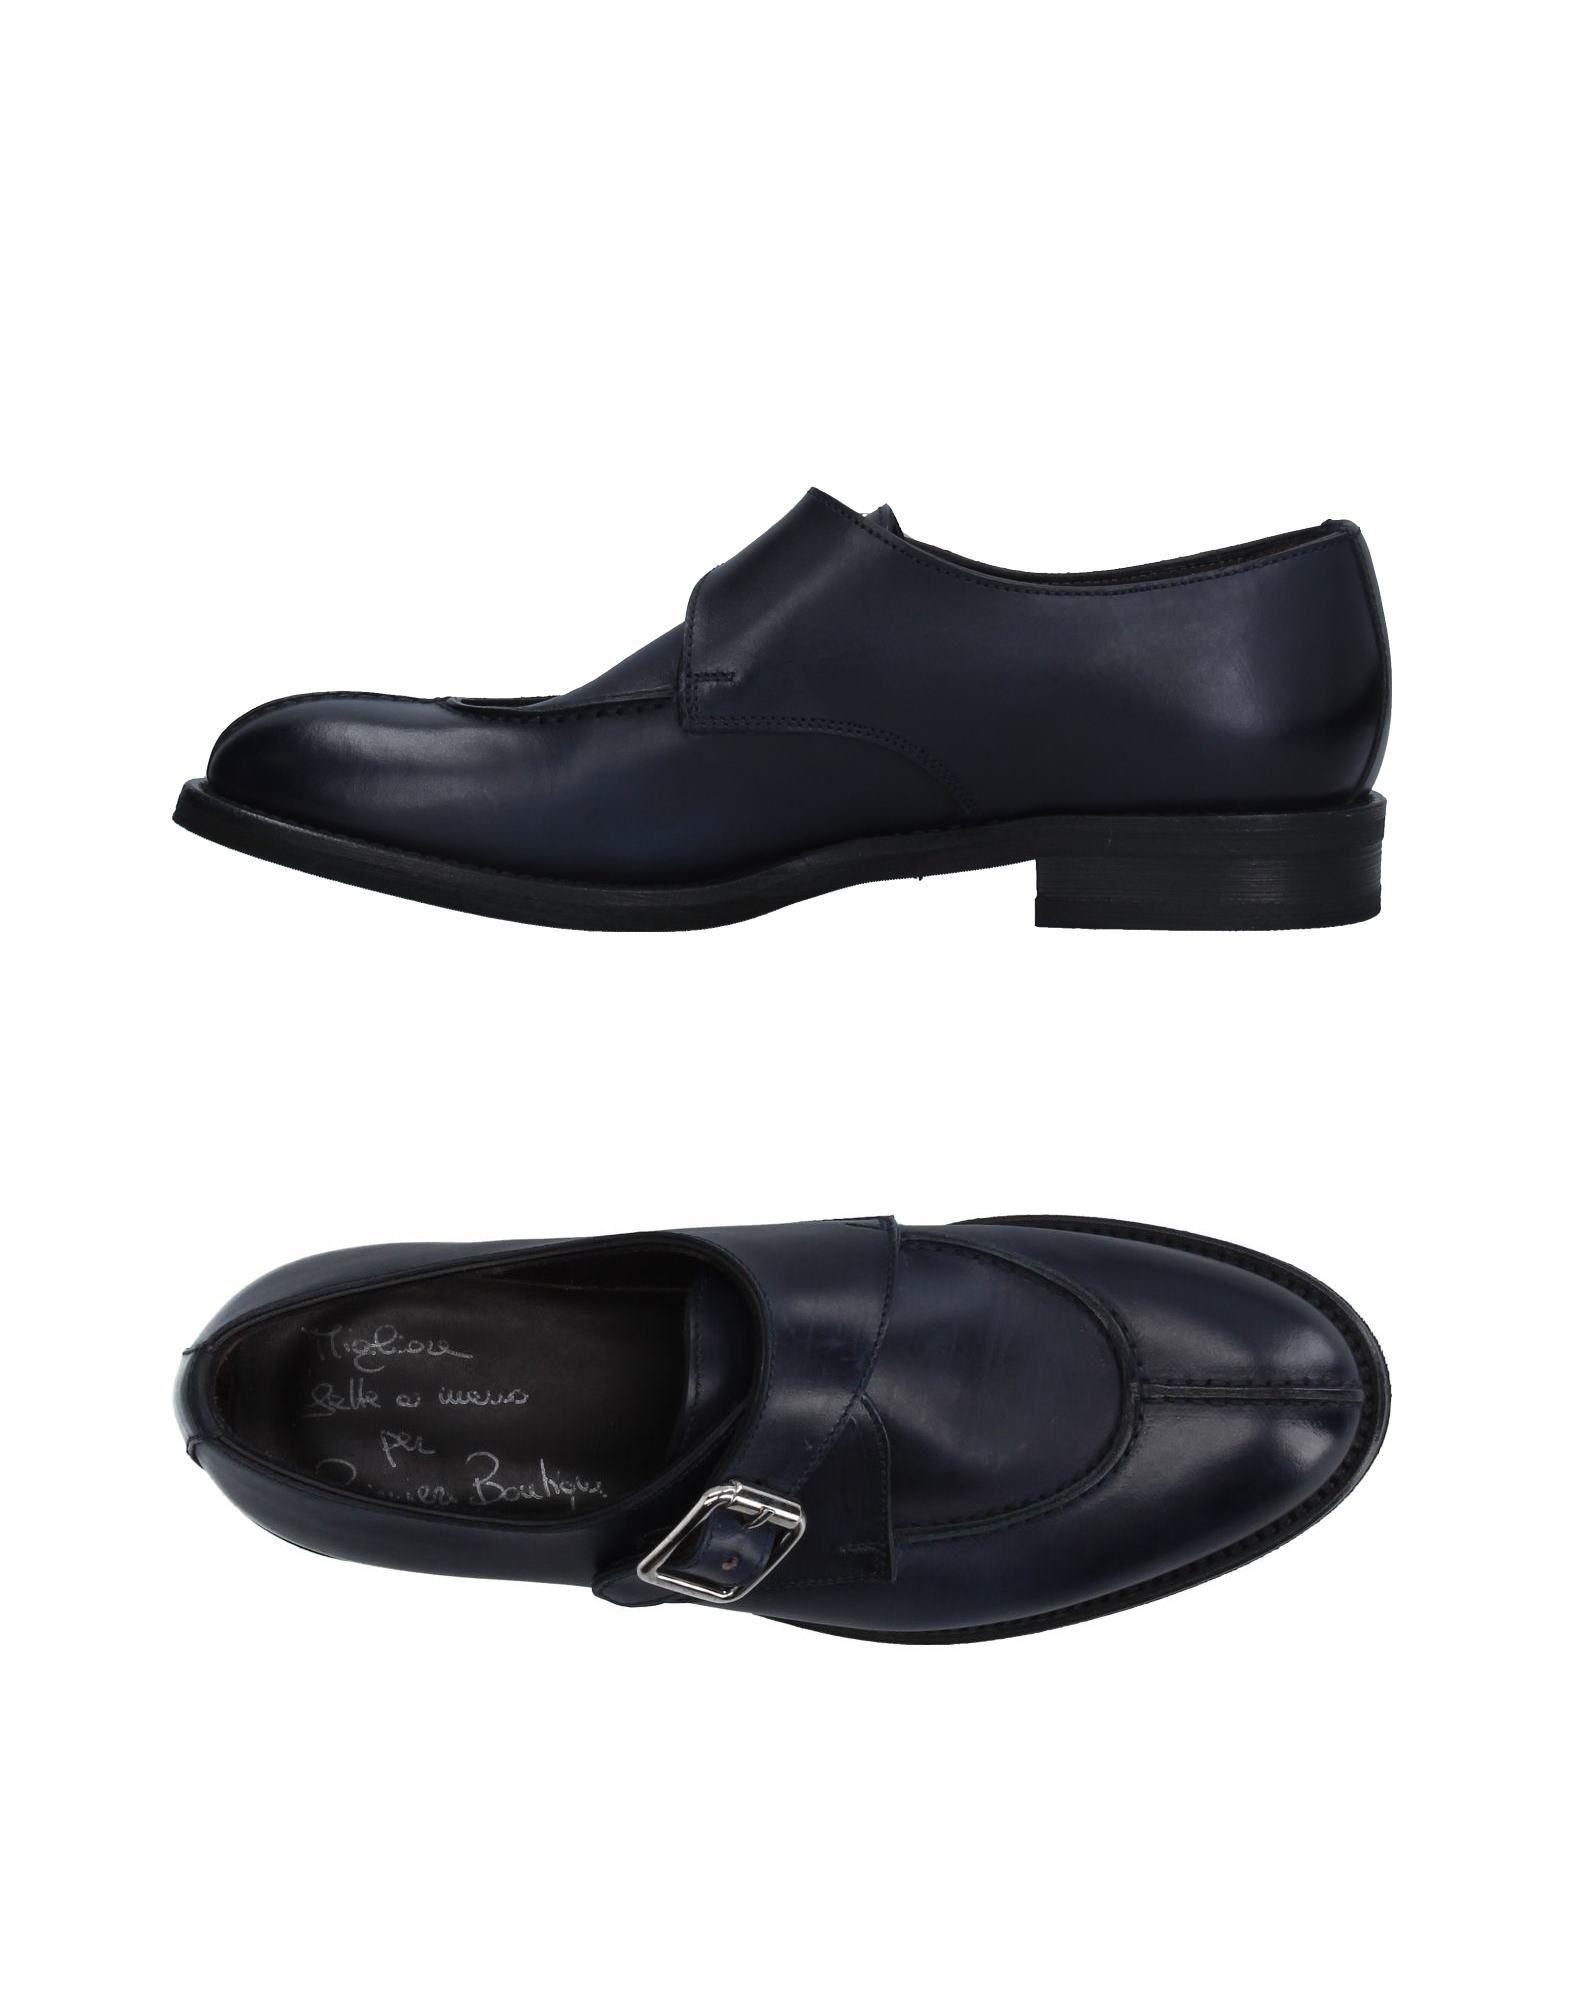 VIBRAM Loafers in Dark Blue